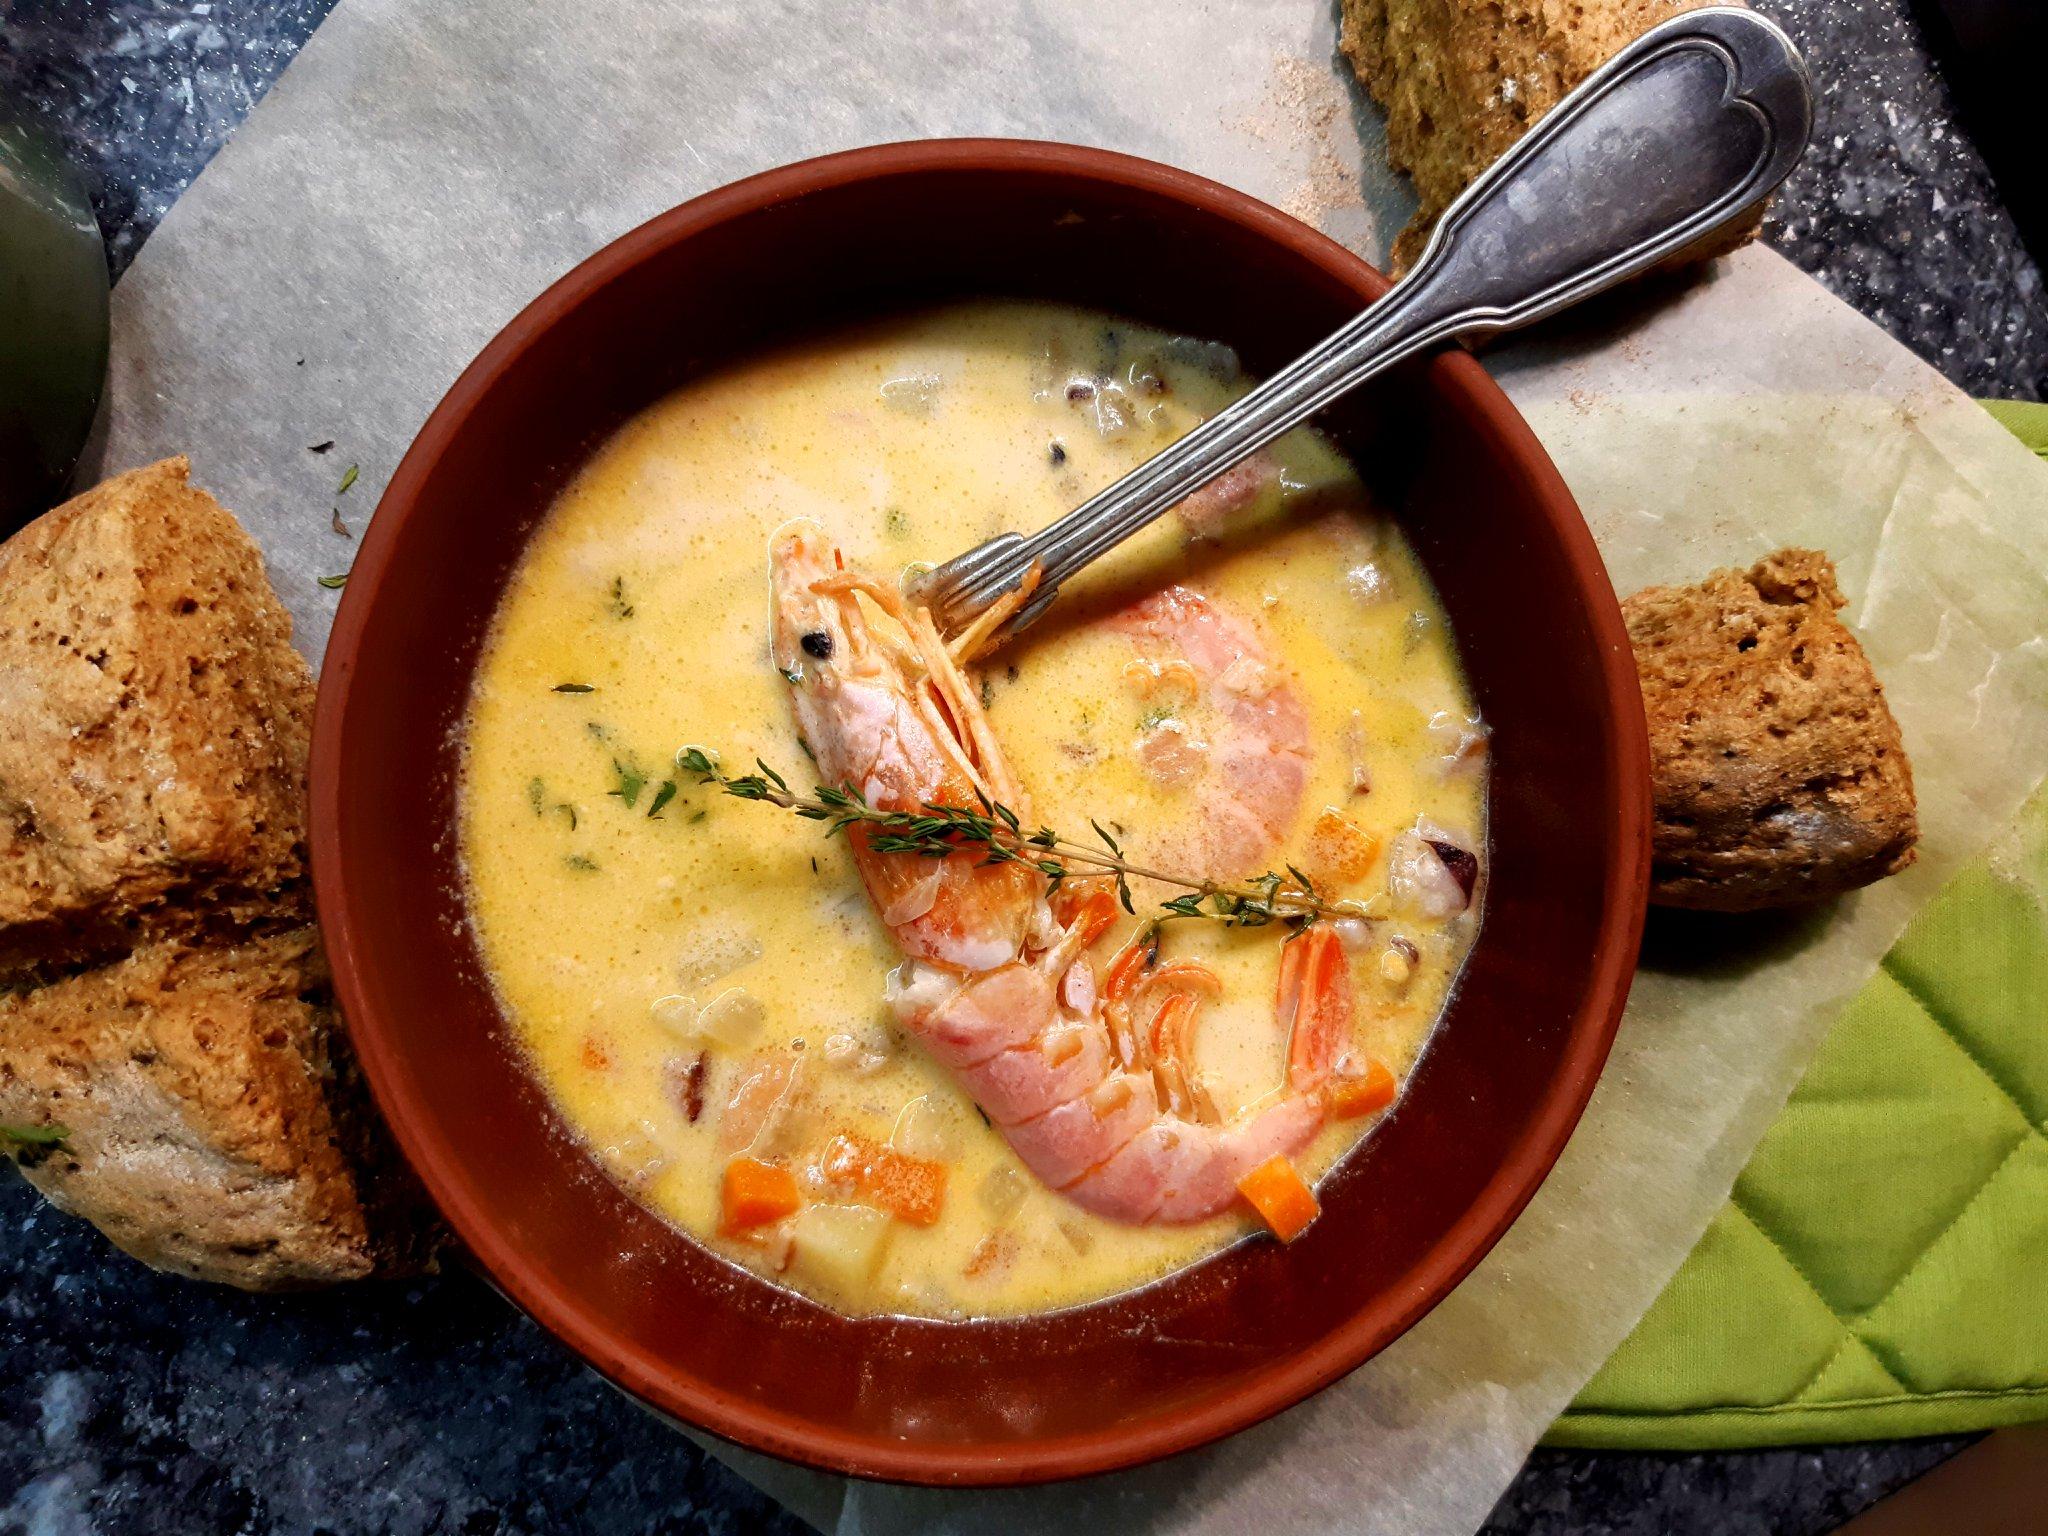 Ирландский суп чаудер с морепродуктами (Irish Seafood Chowder)